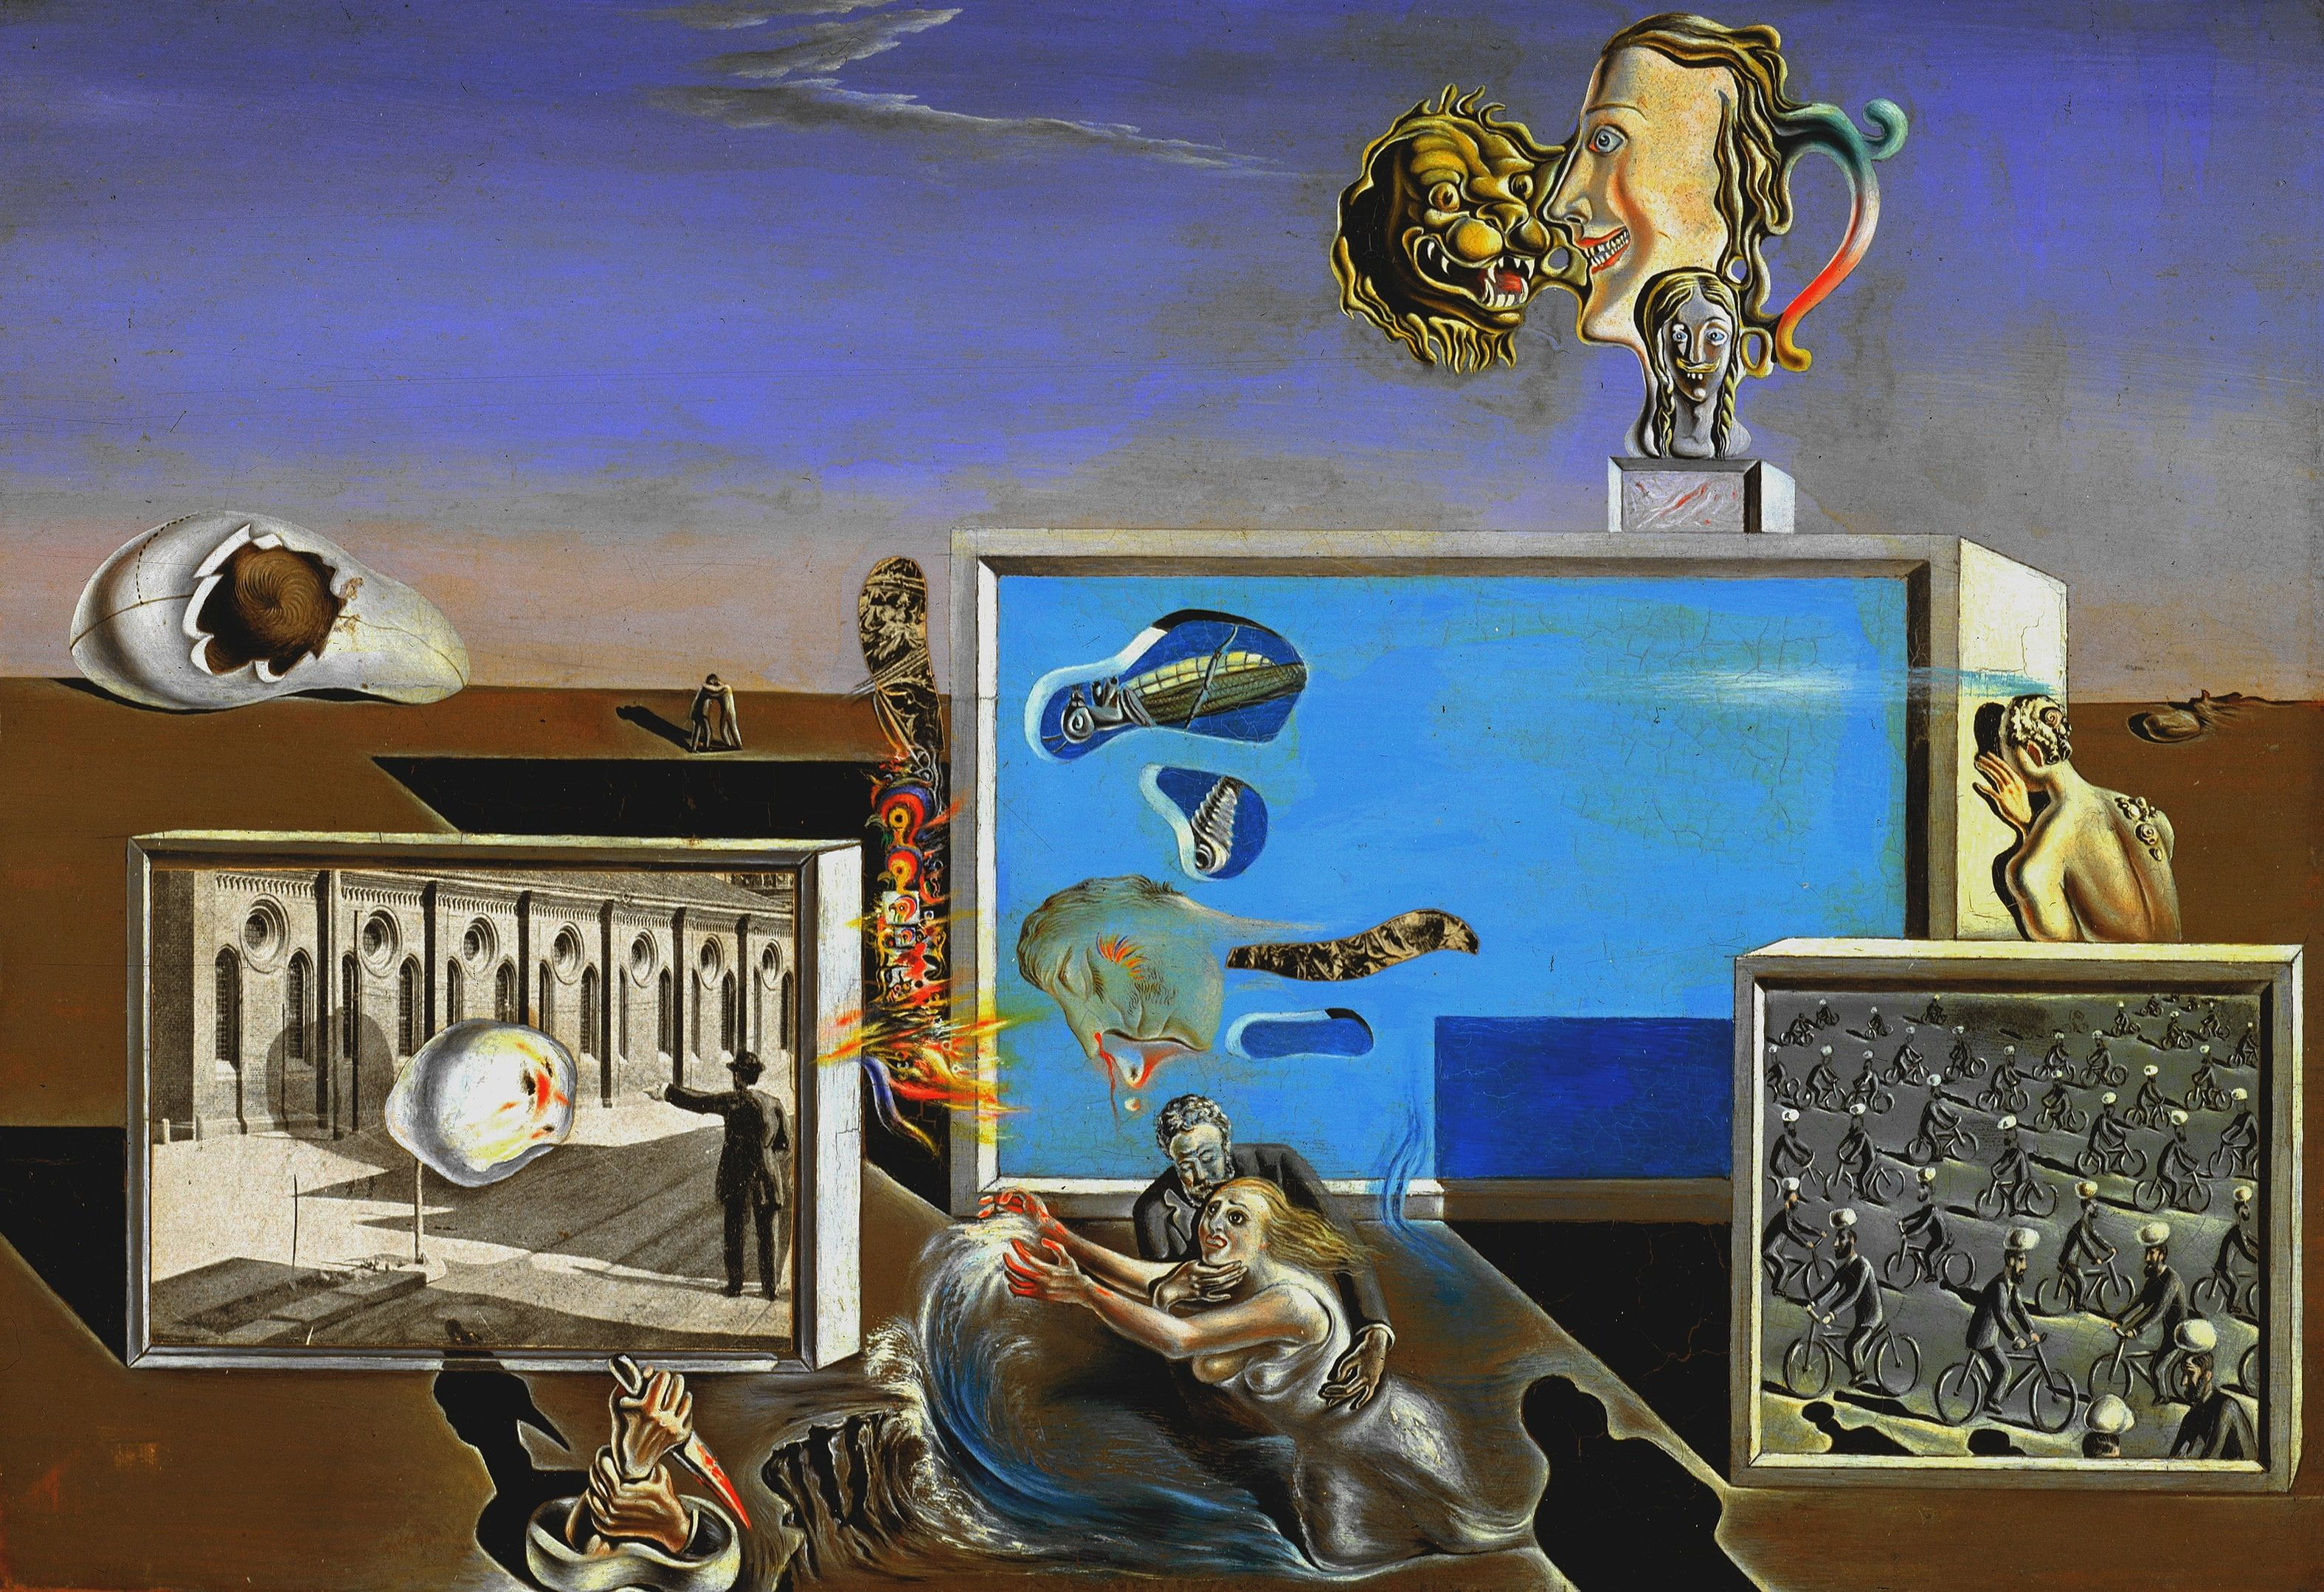 Surrealism Picture Salvador Dali Salvador Dali Enlightened Fun 2k Wallpaper Hdwallpaper Desktop In 2020 Salvador Dali Paintings Salvador Dali Art